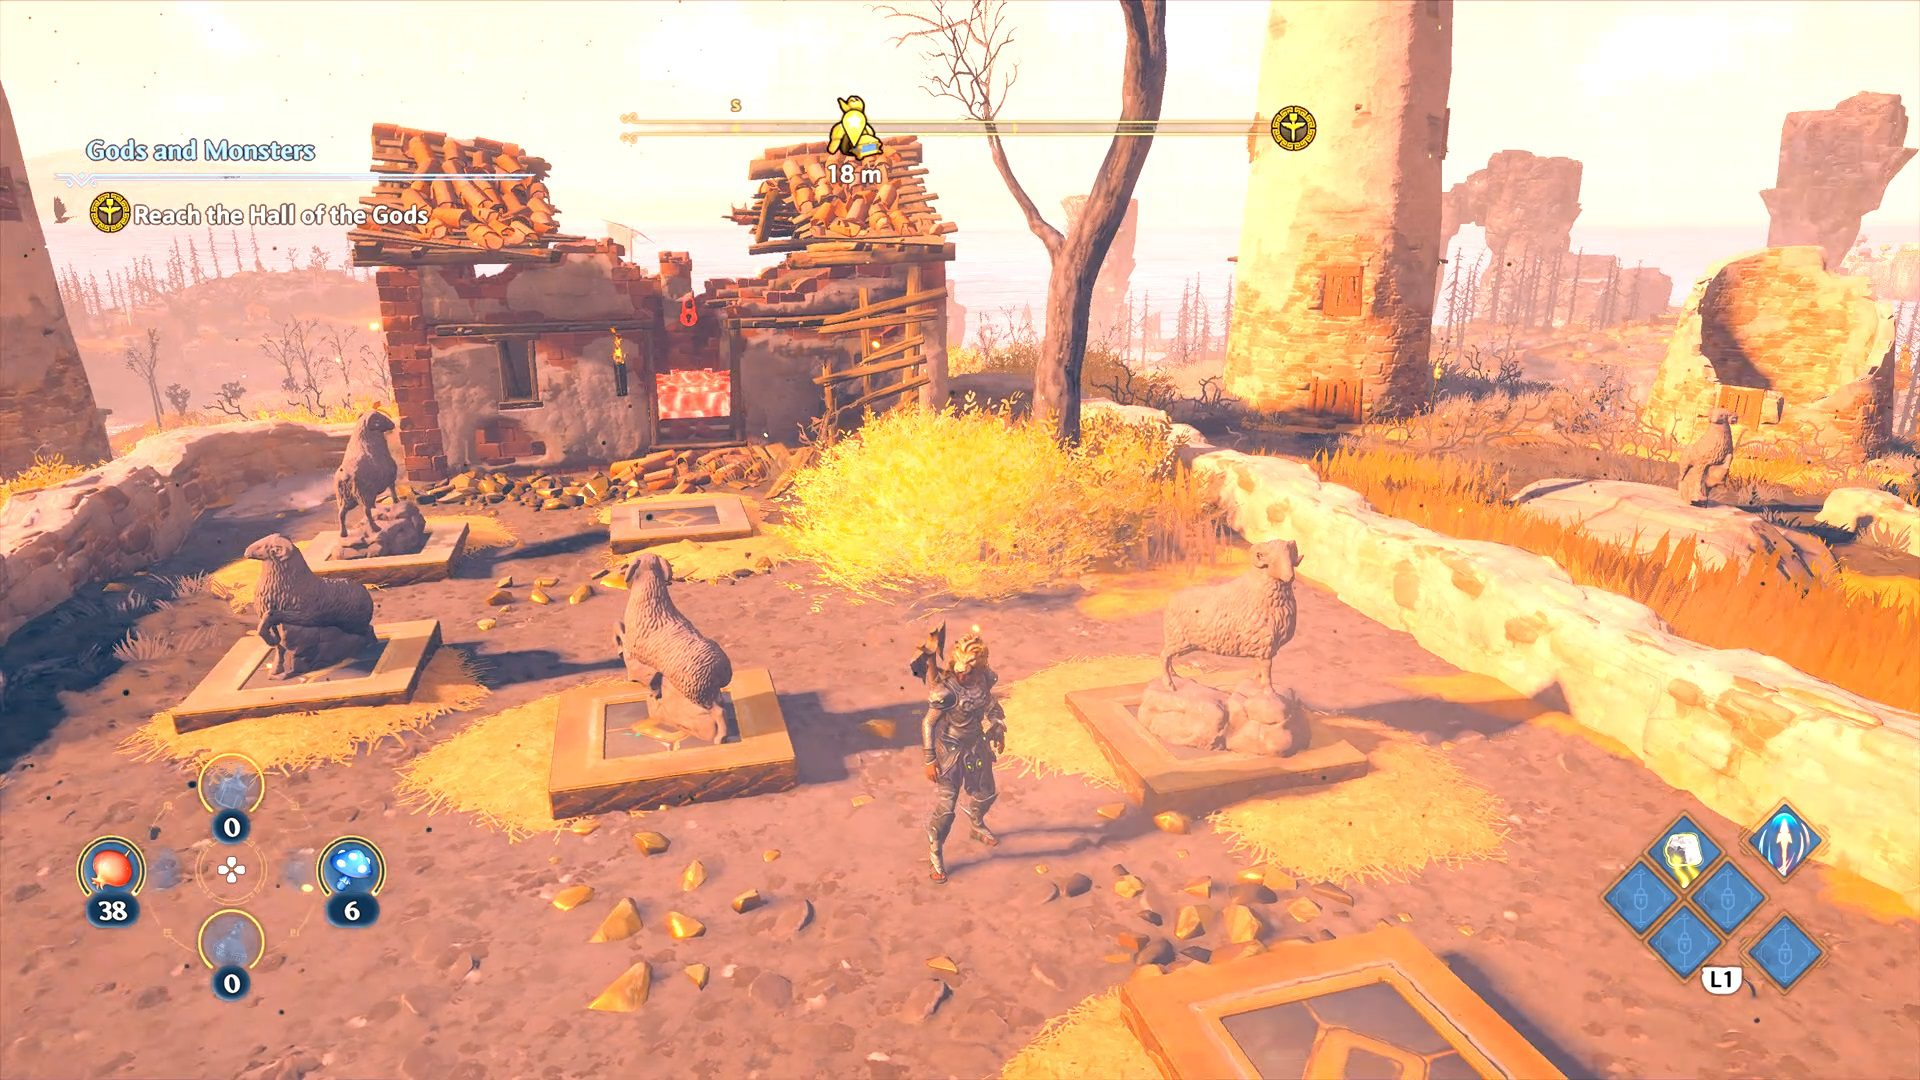 Immortals Fenyx Rising Clashing Rocks Stone Sheep Location